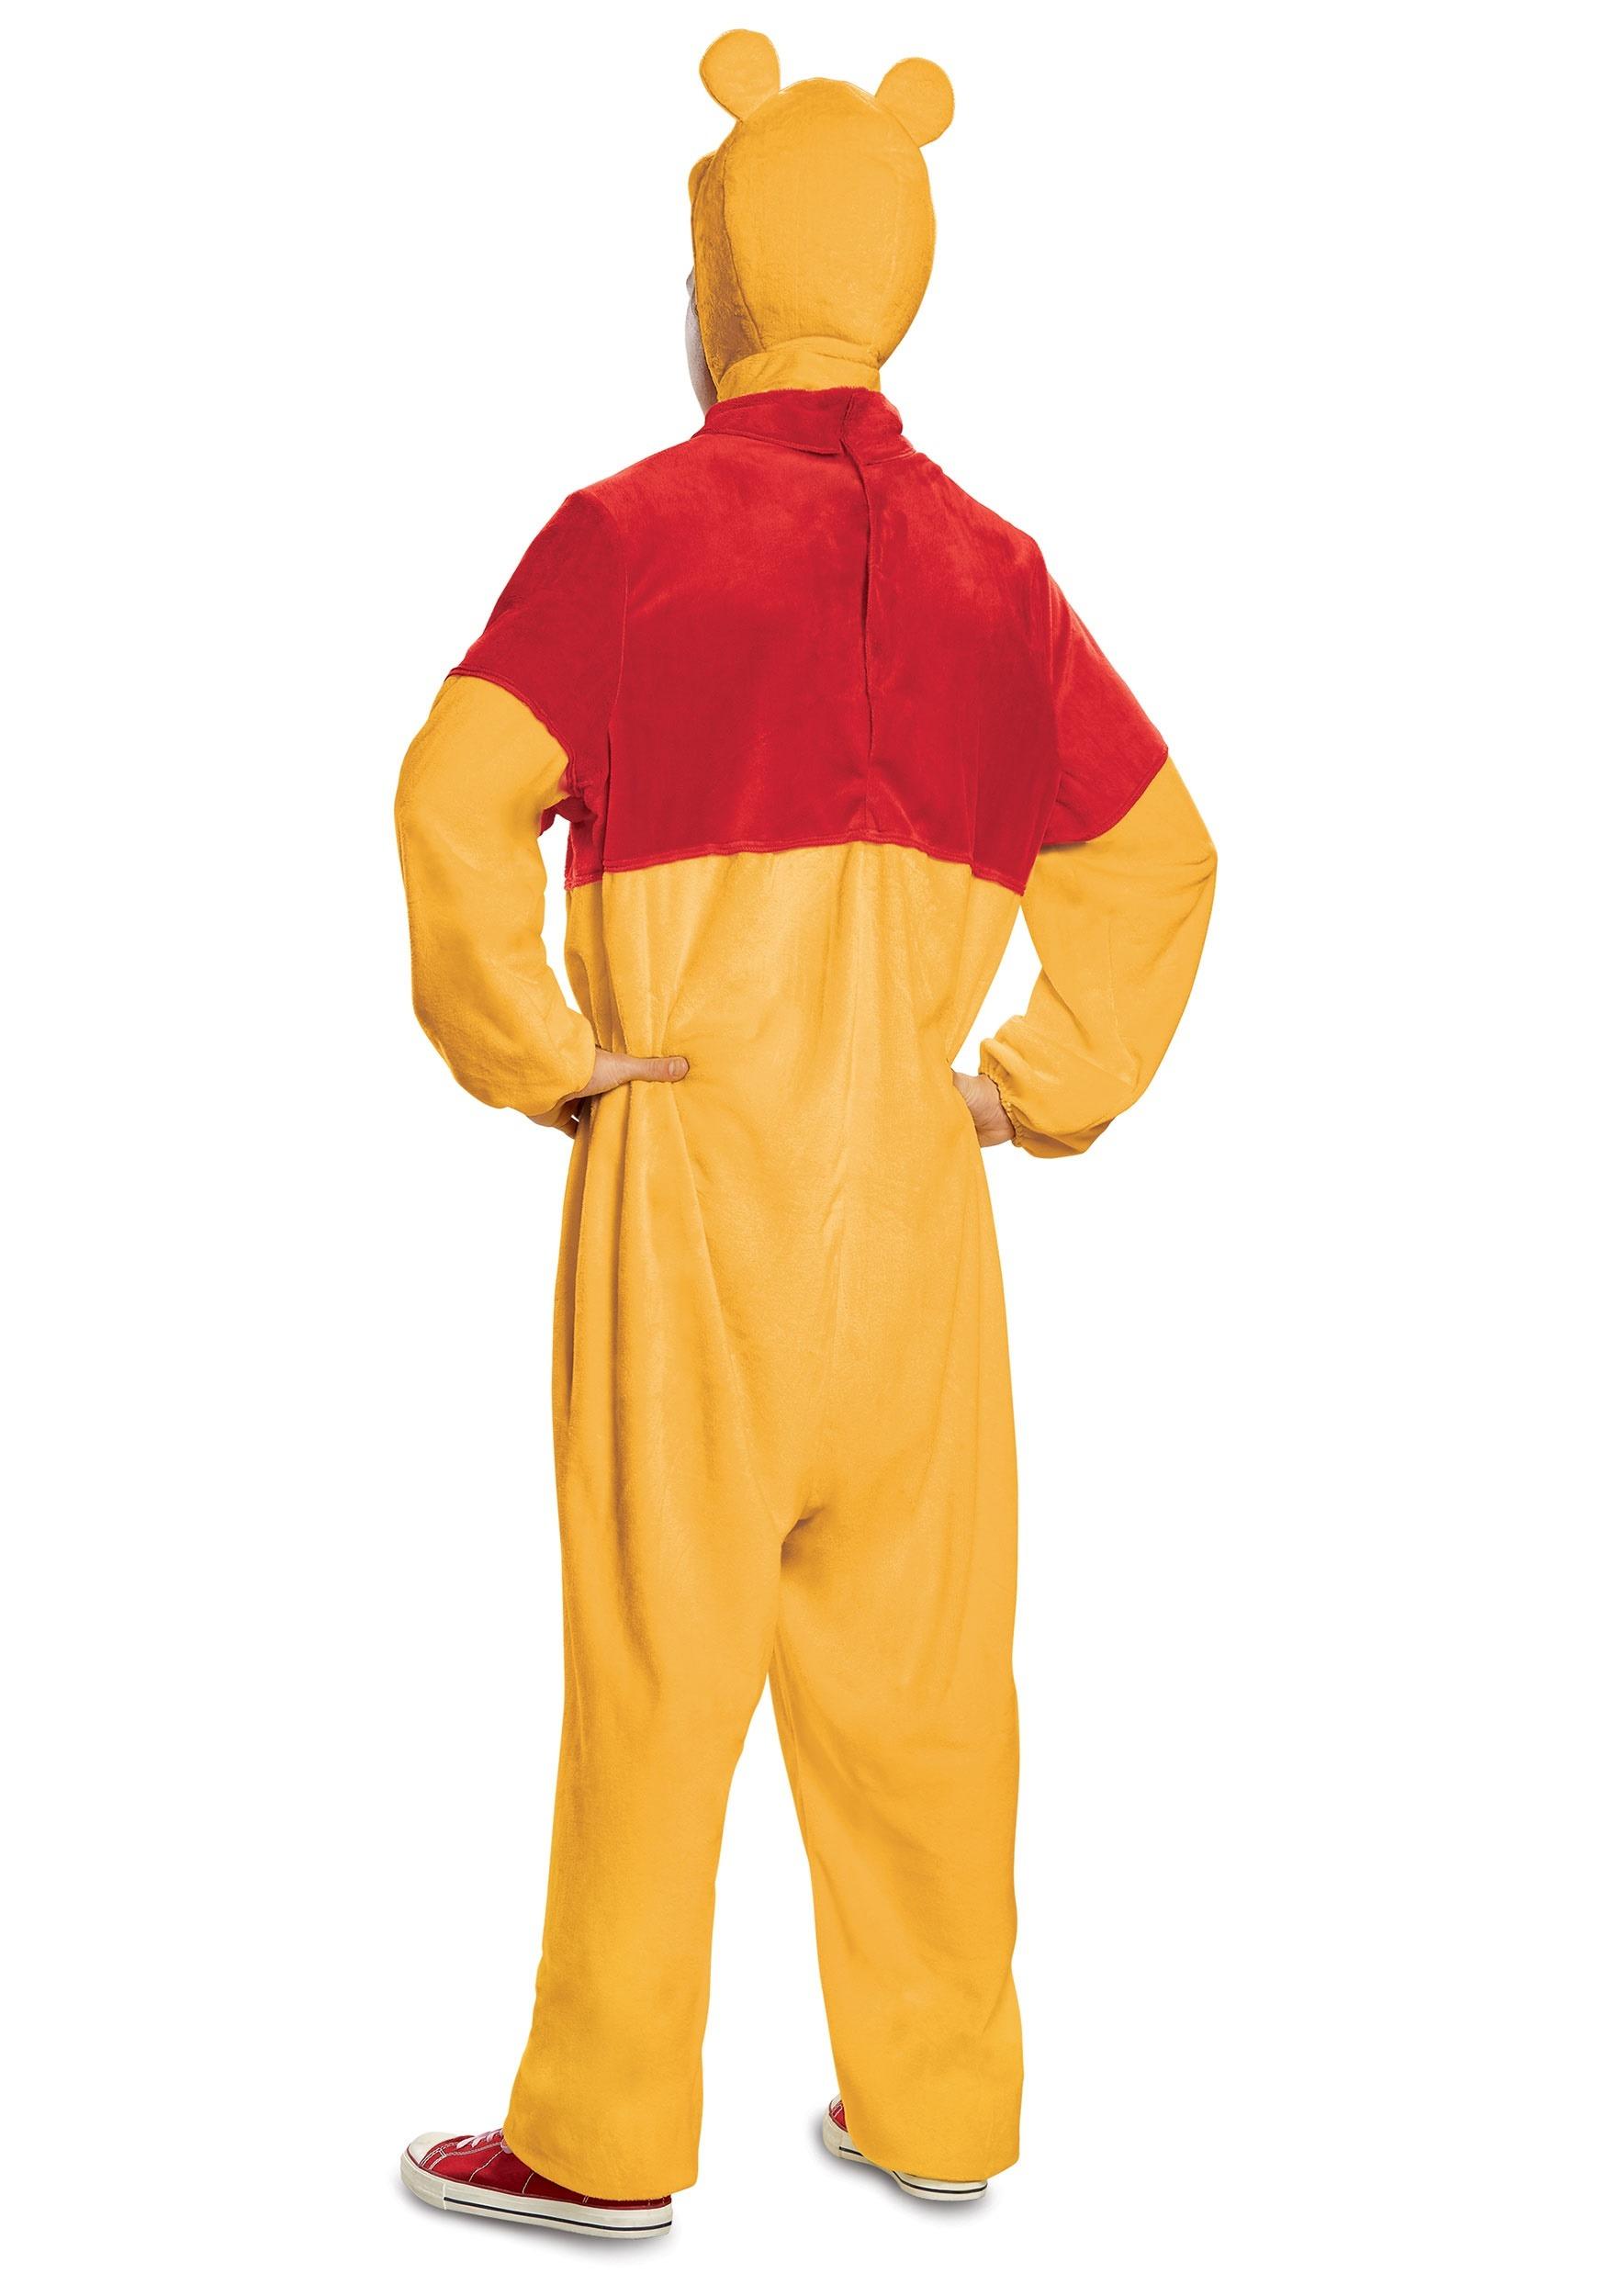 Amazoncom winnie pooh costume